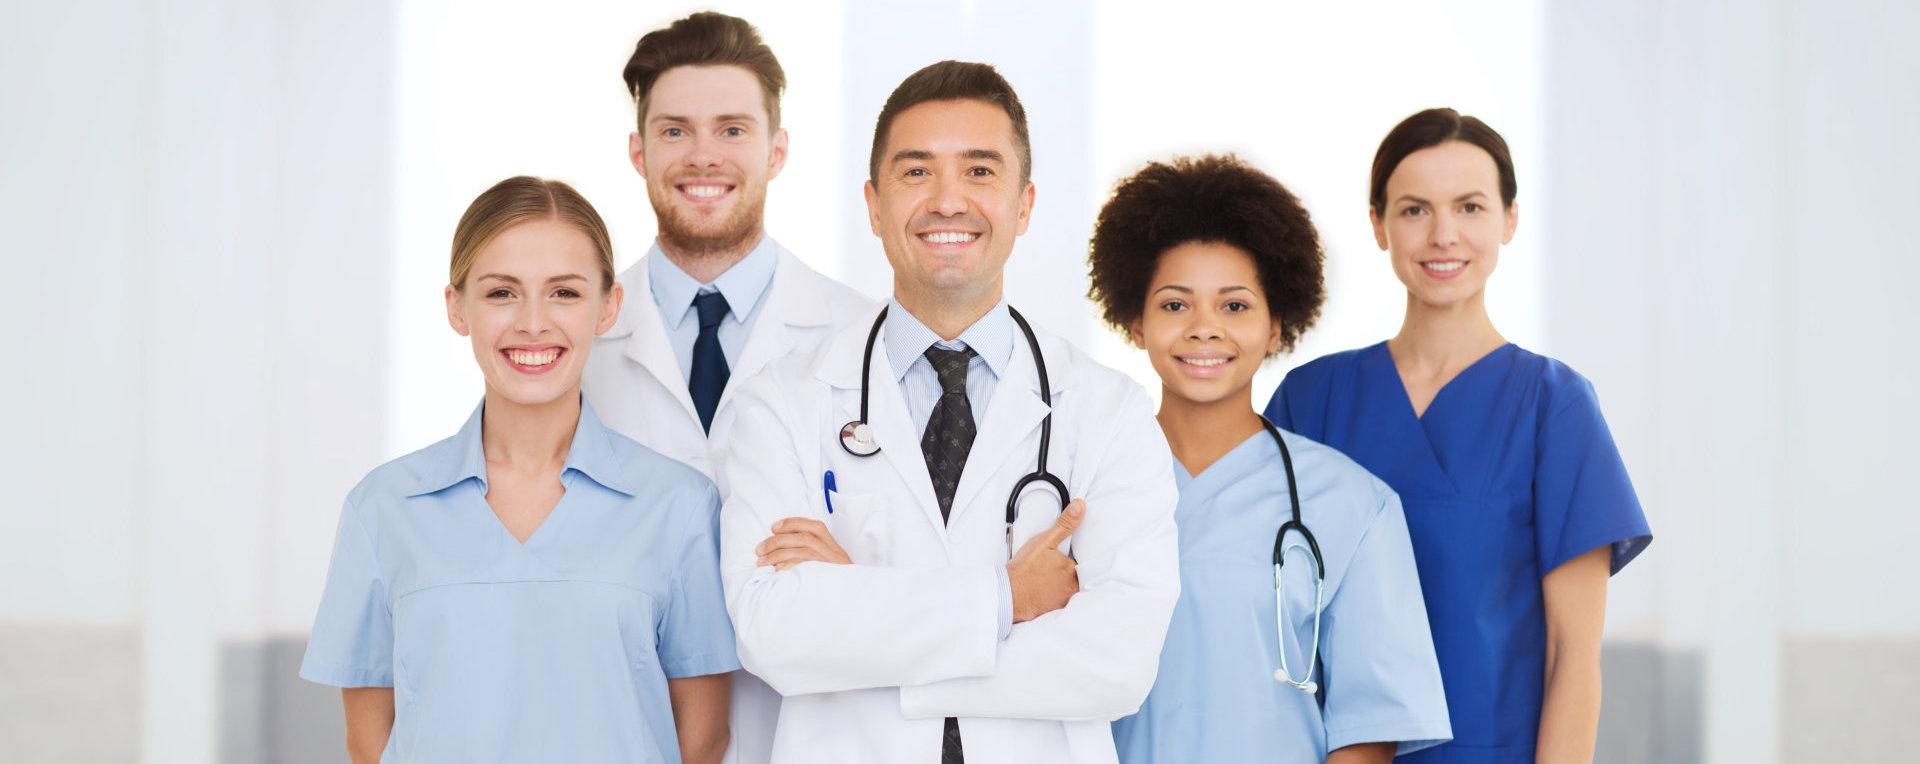 medical professionals smiling indoor